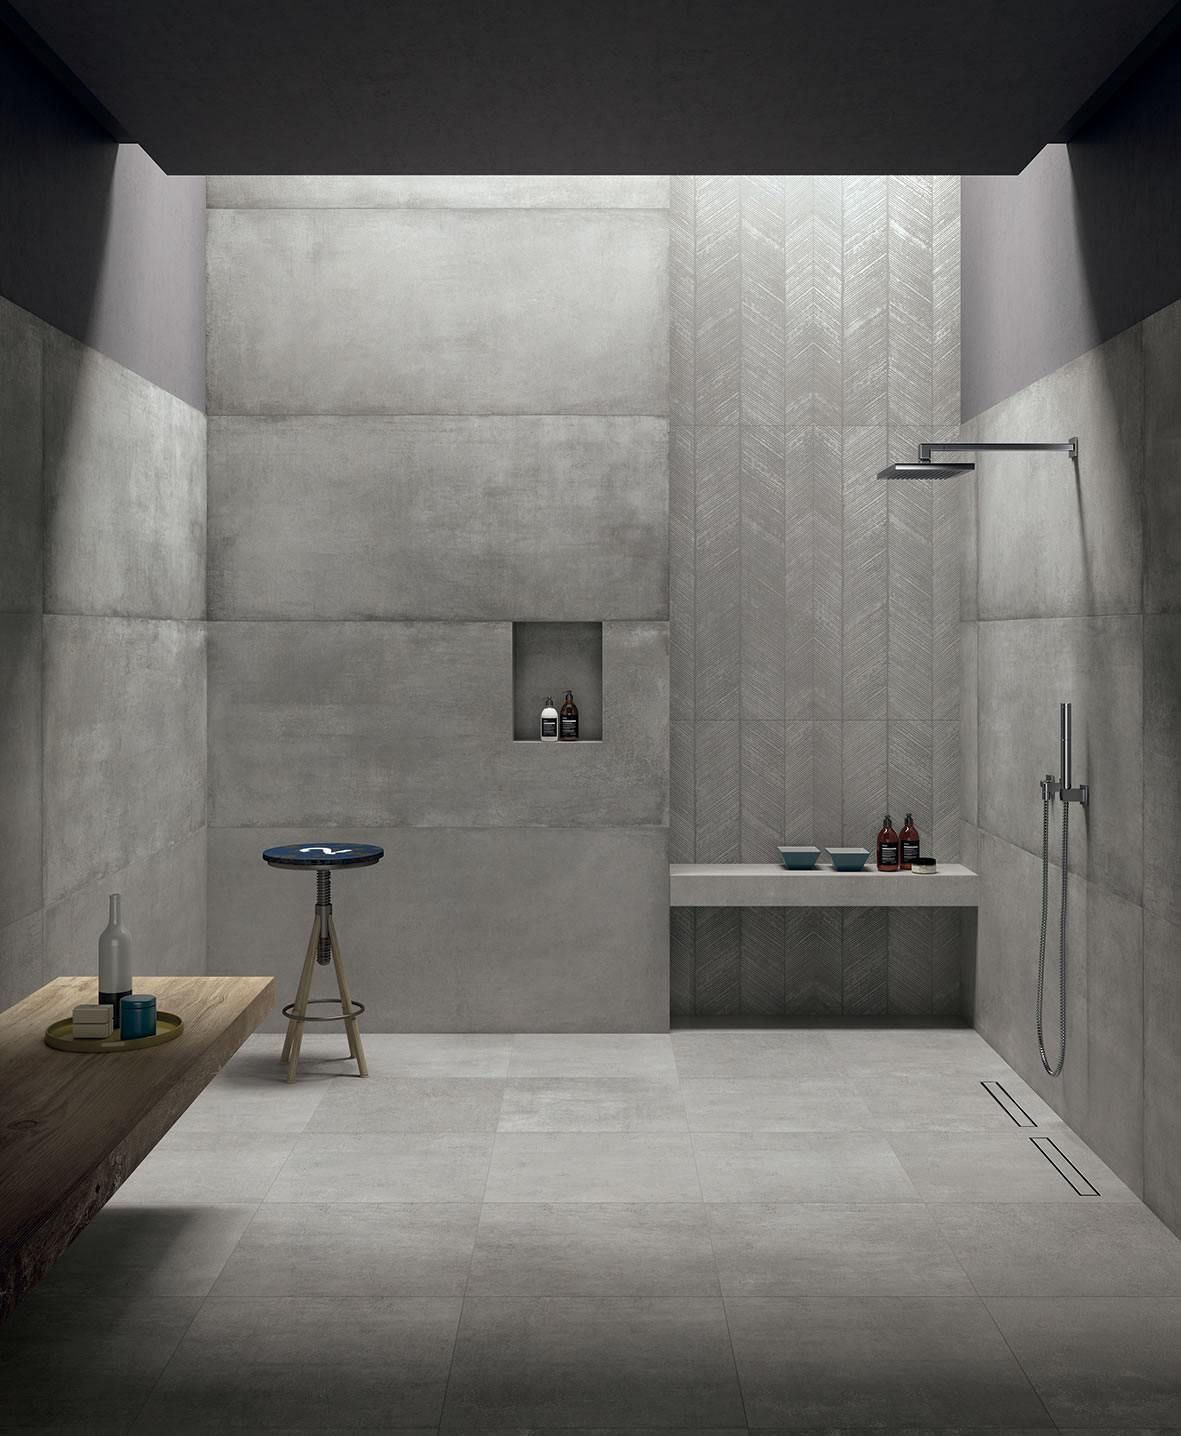 prima materia cemento 60x60 rectified floor 80x180 rectified 60x120 struttura lisca wall. Black Bedroom Furniture Sets. Home Design Ideas